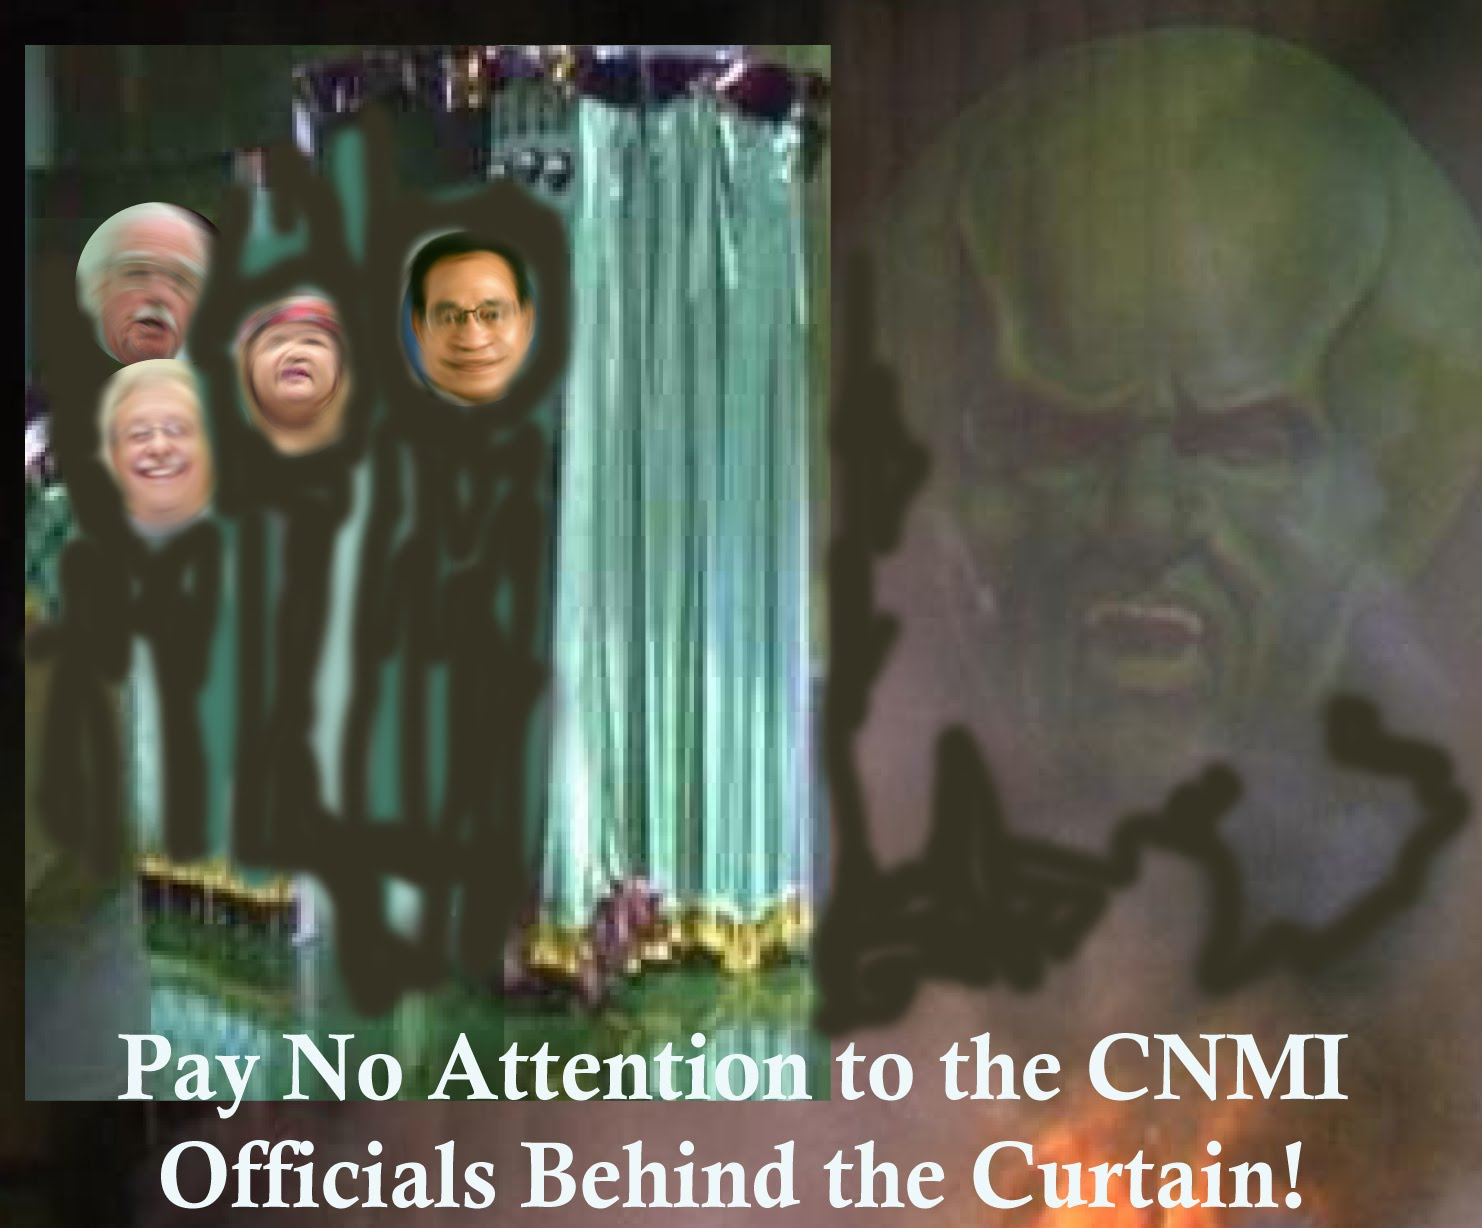 [cnmi+curtain]